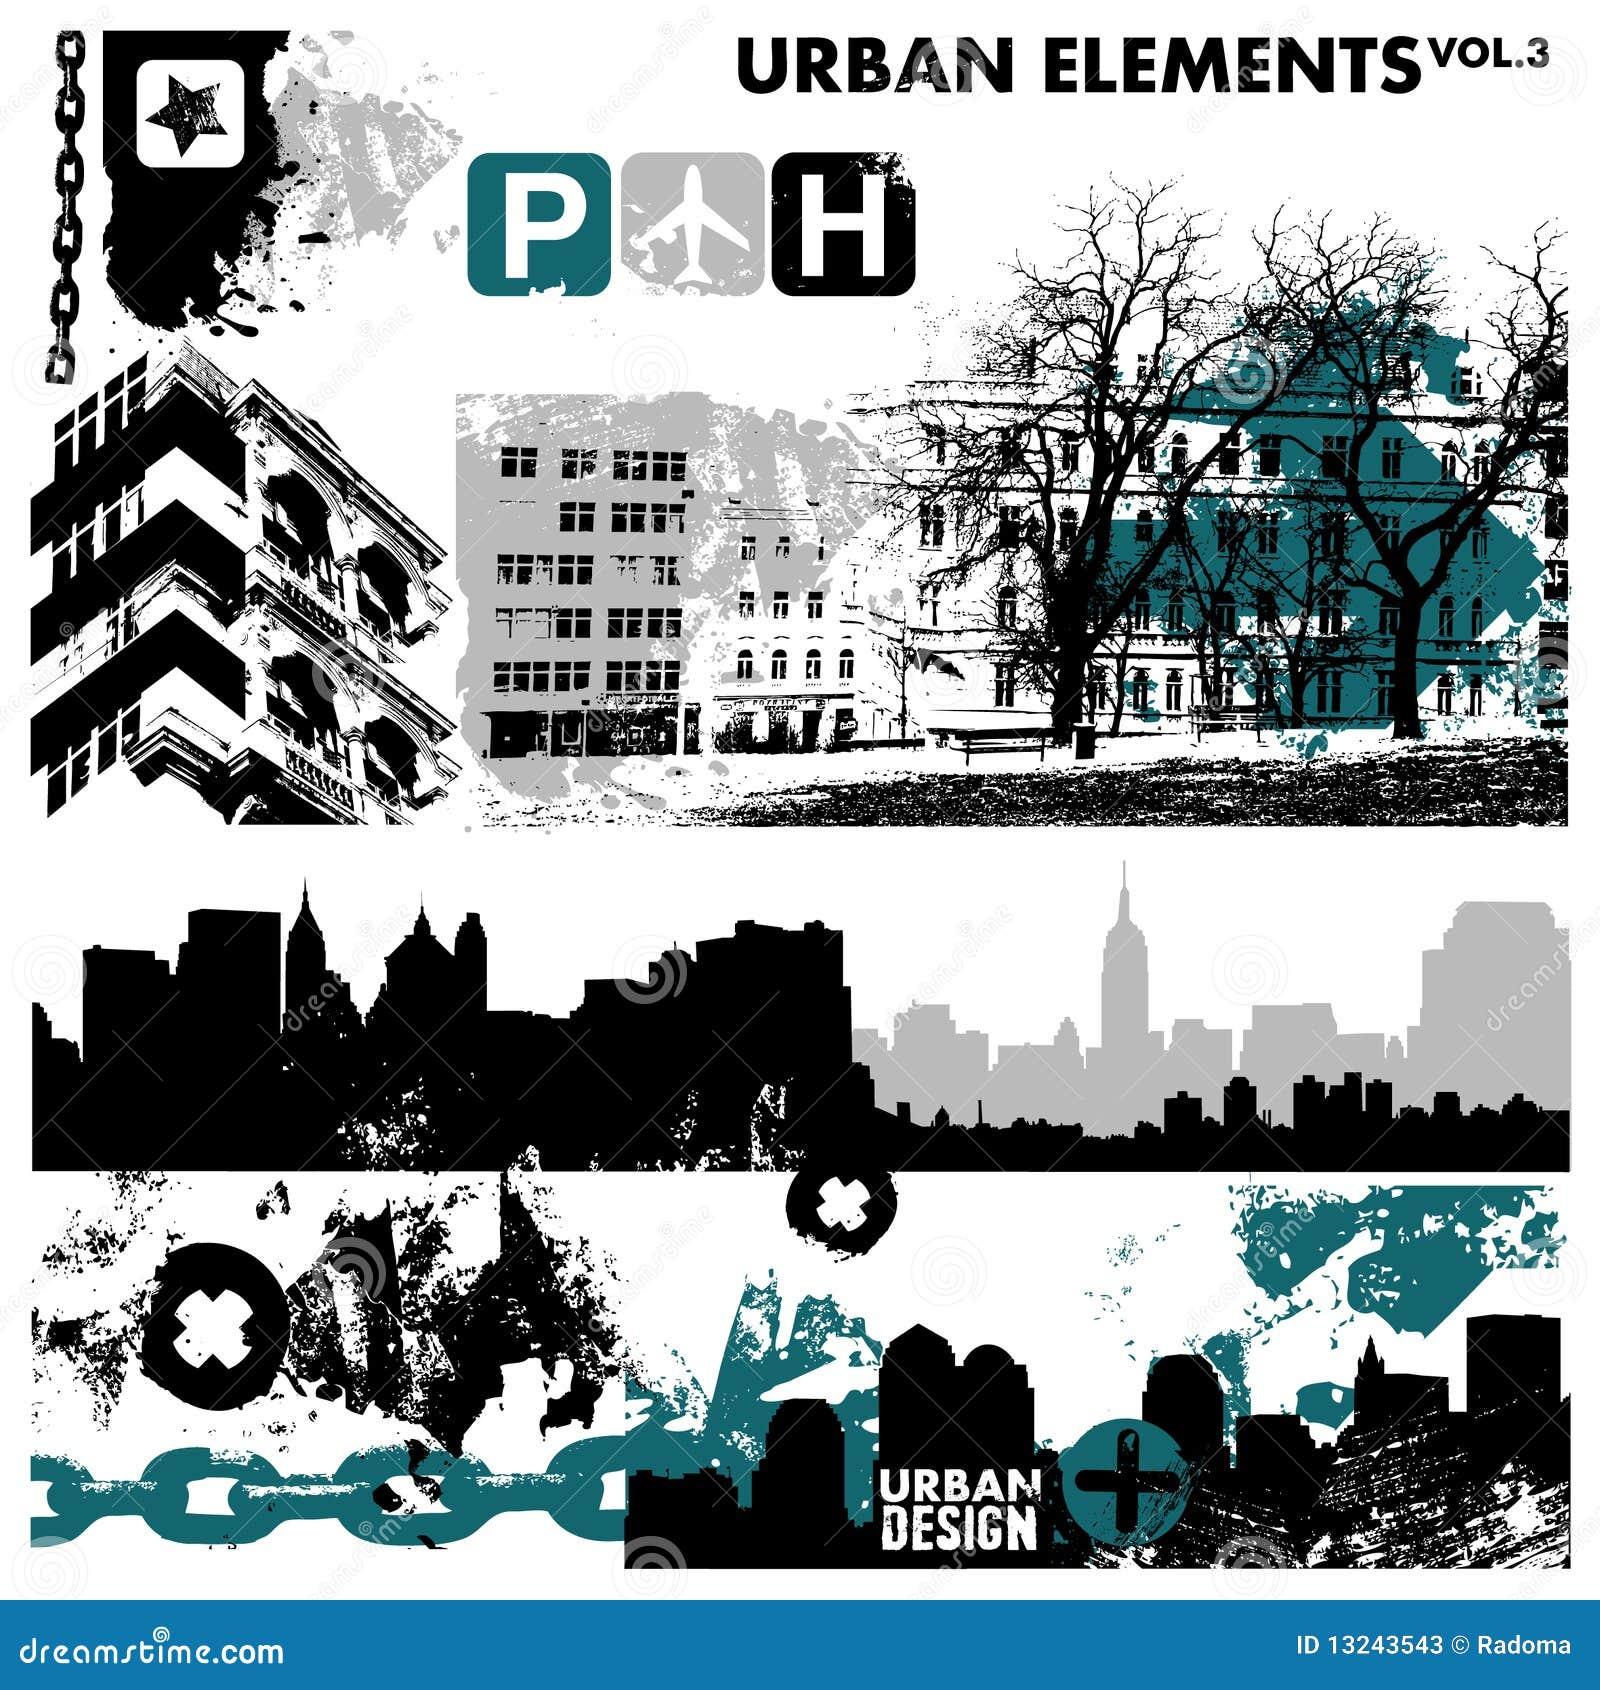 Elementos gráficos urbanos 3